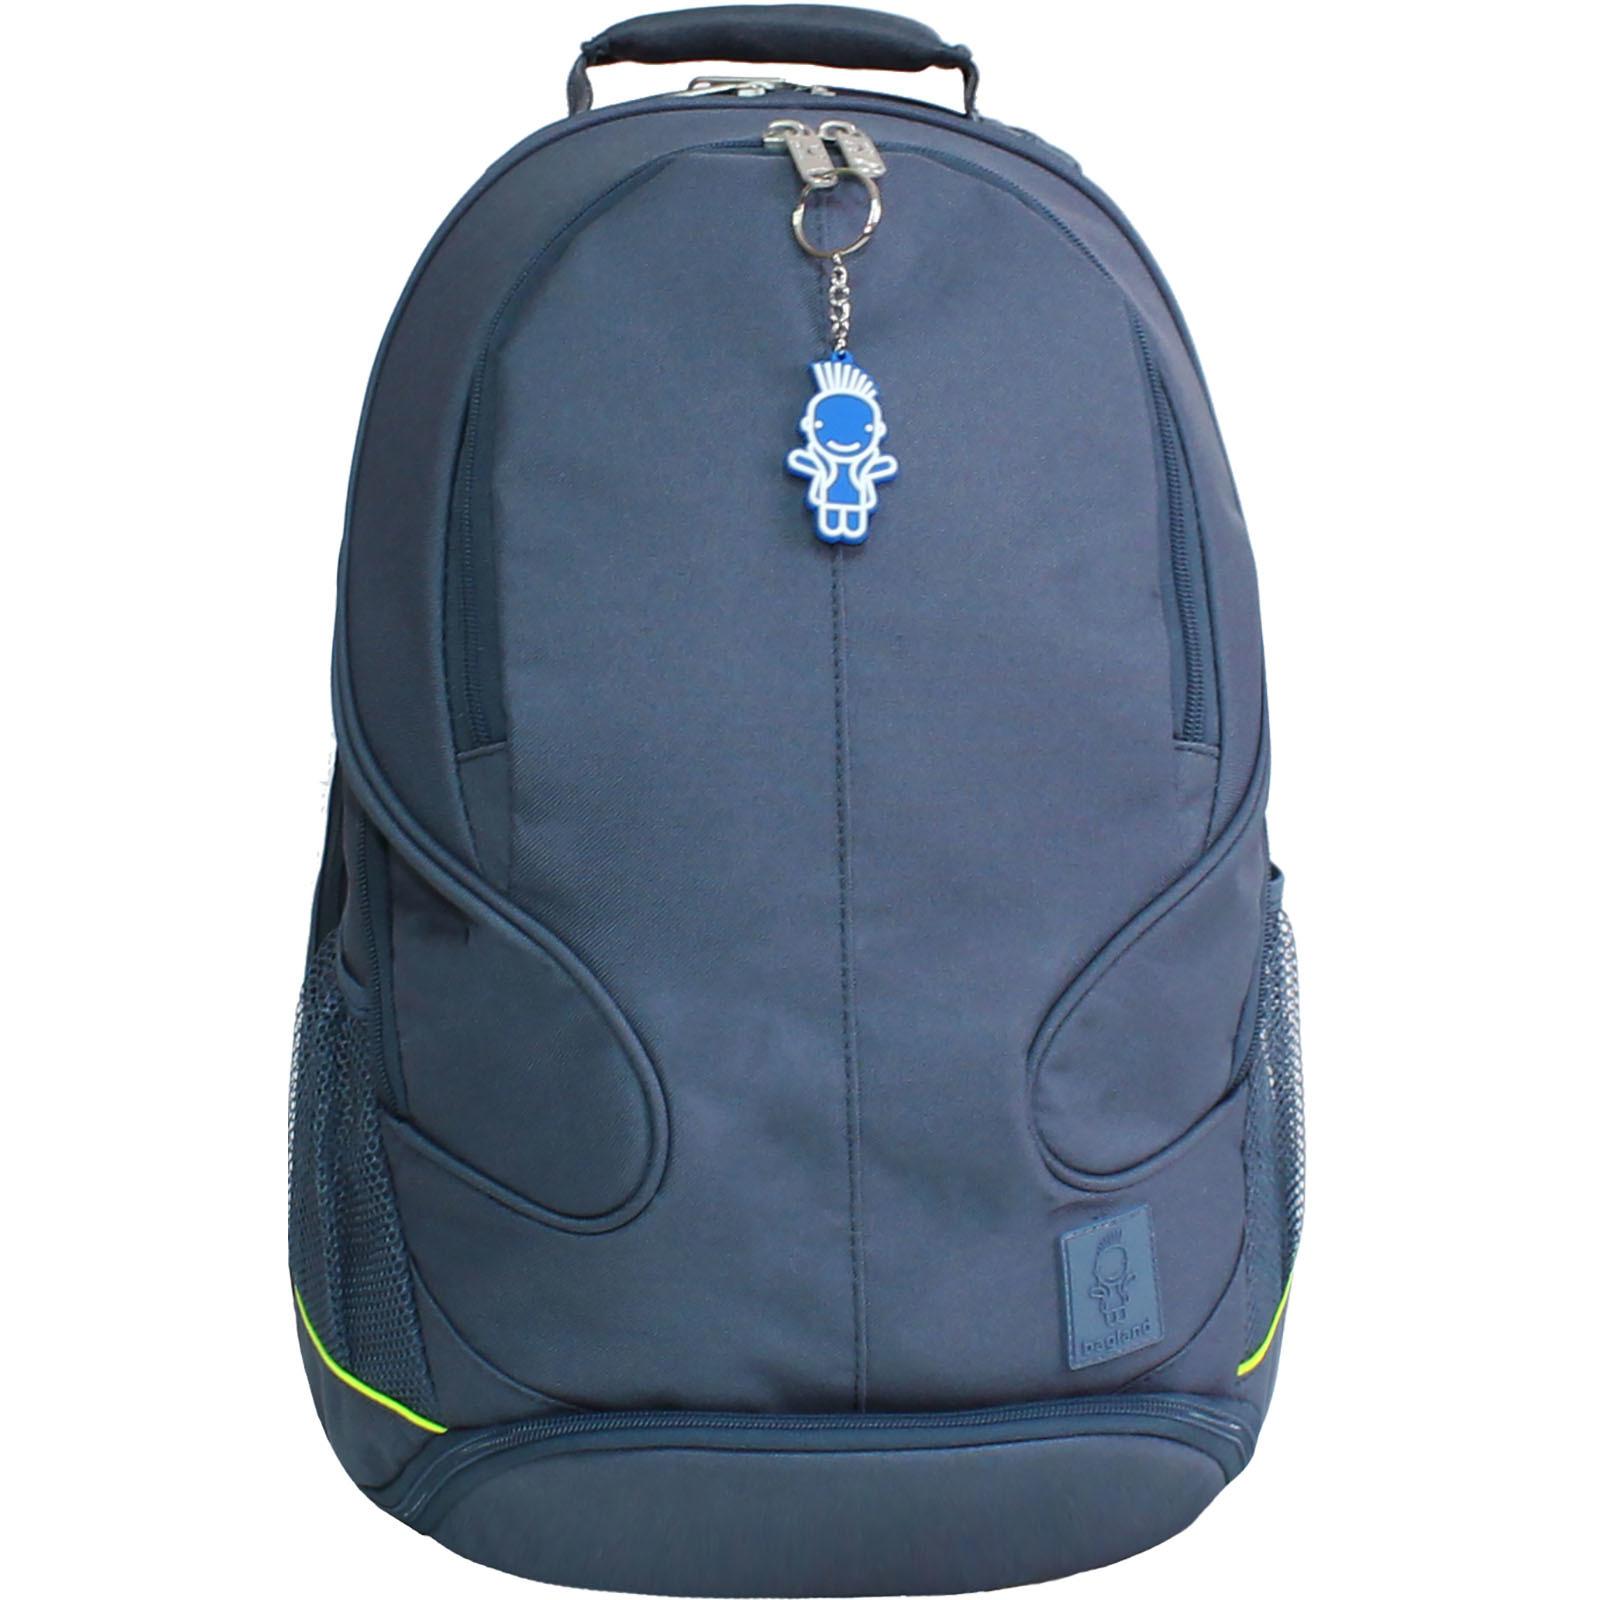 Рюкзаки для ноутбука Рюкзак для ноутбука Bagland Рюкзак ZOOTY 24 л. Серый (00531662) IMG_8978.JPG